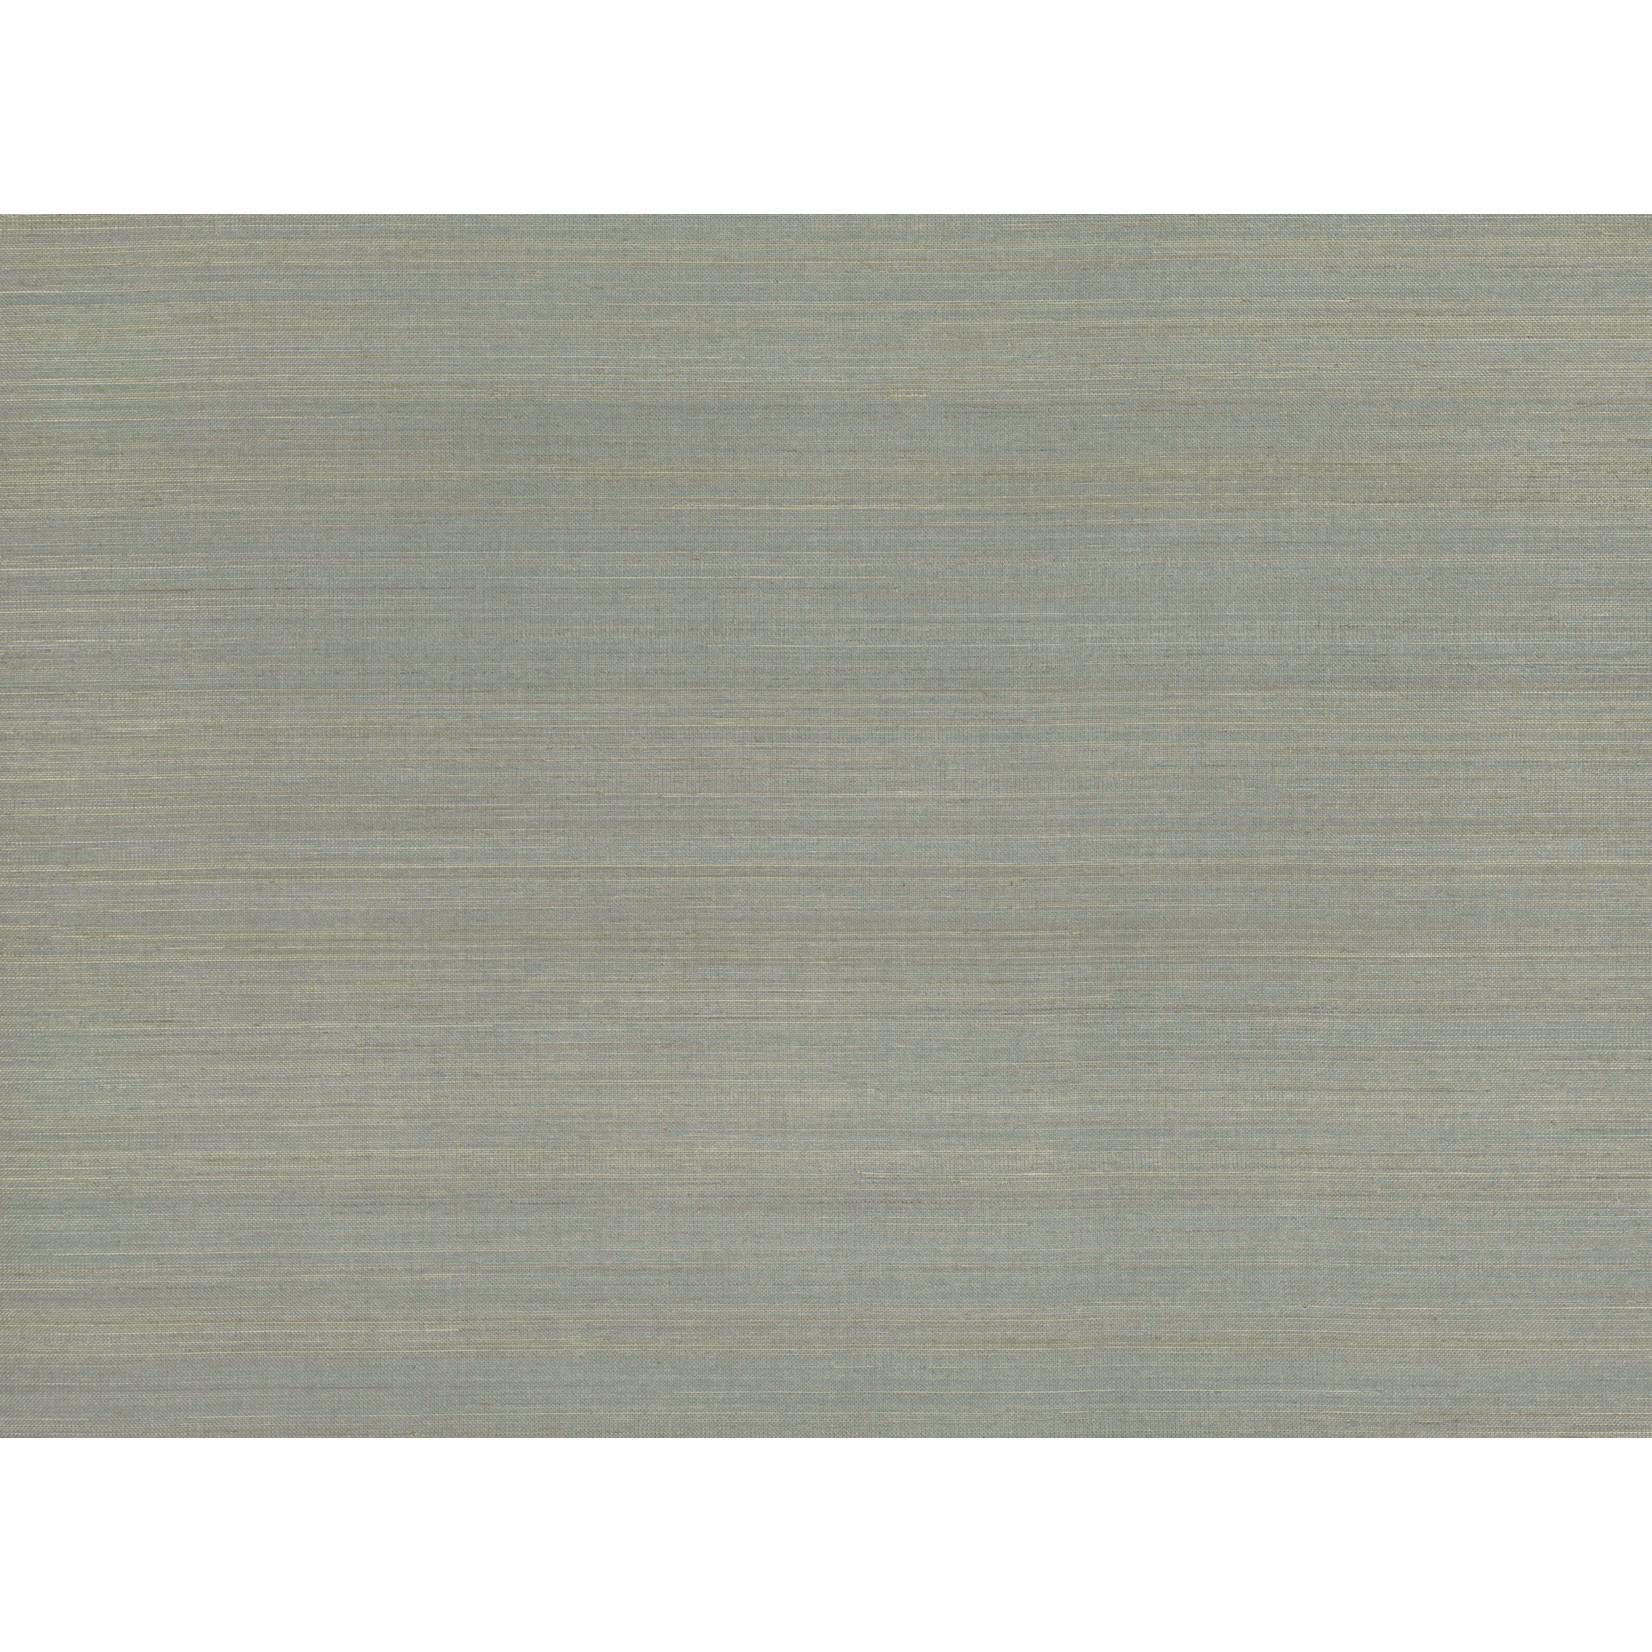 Mark Alexander Grasscloth Handwoven Wallcoverings | Abaca Lake